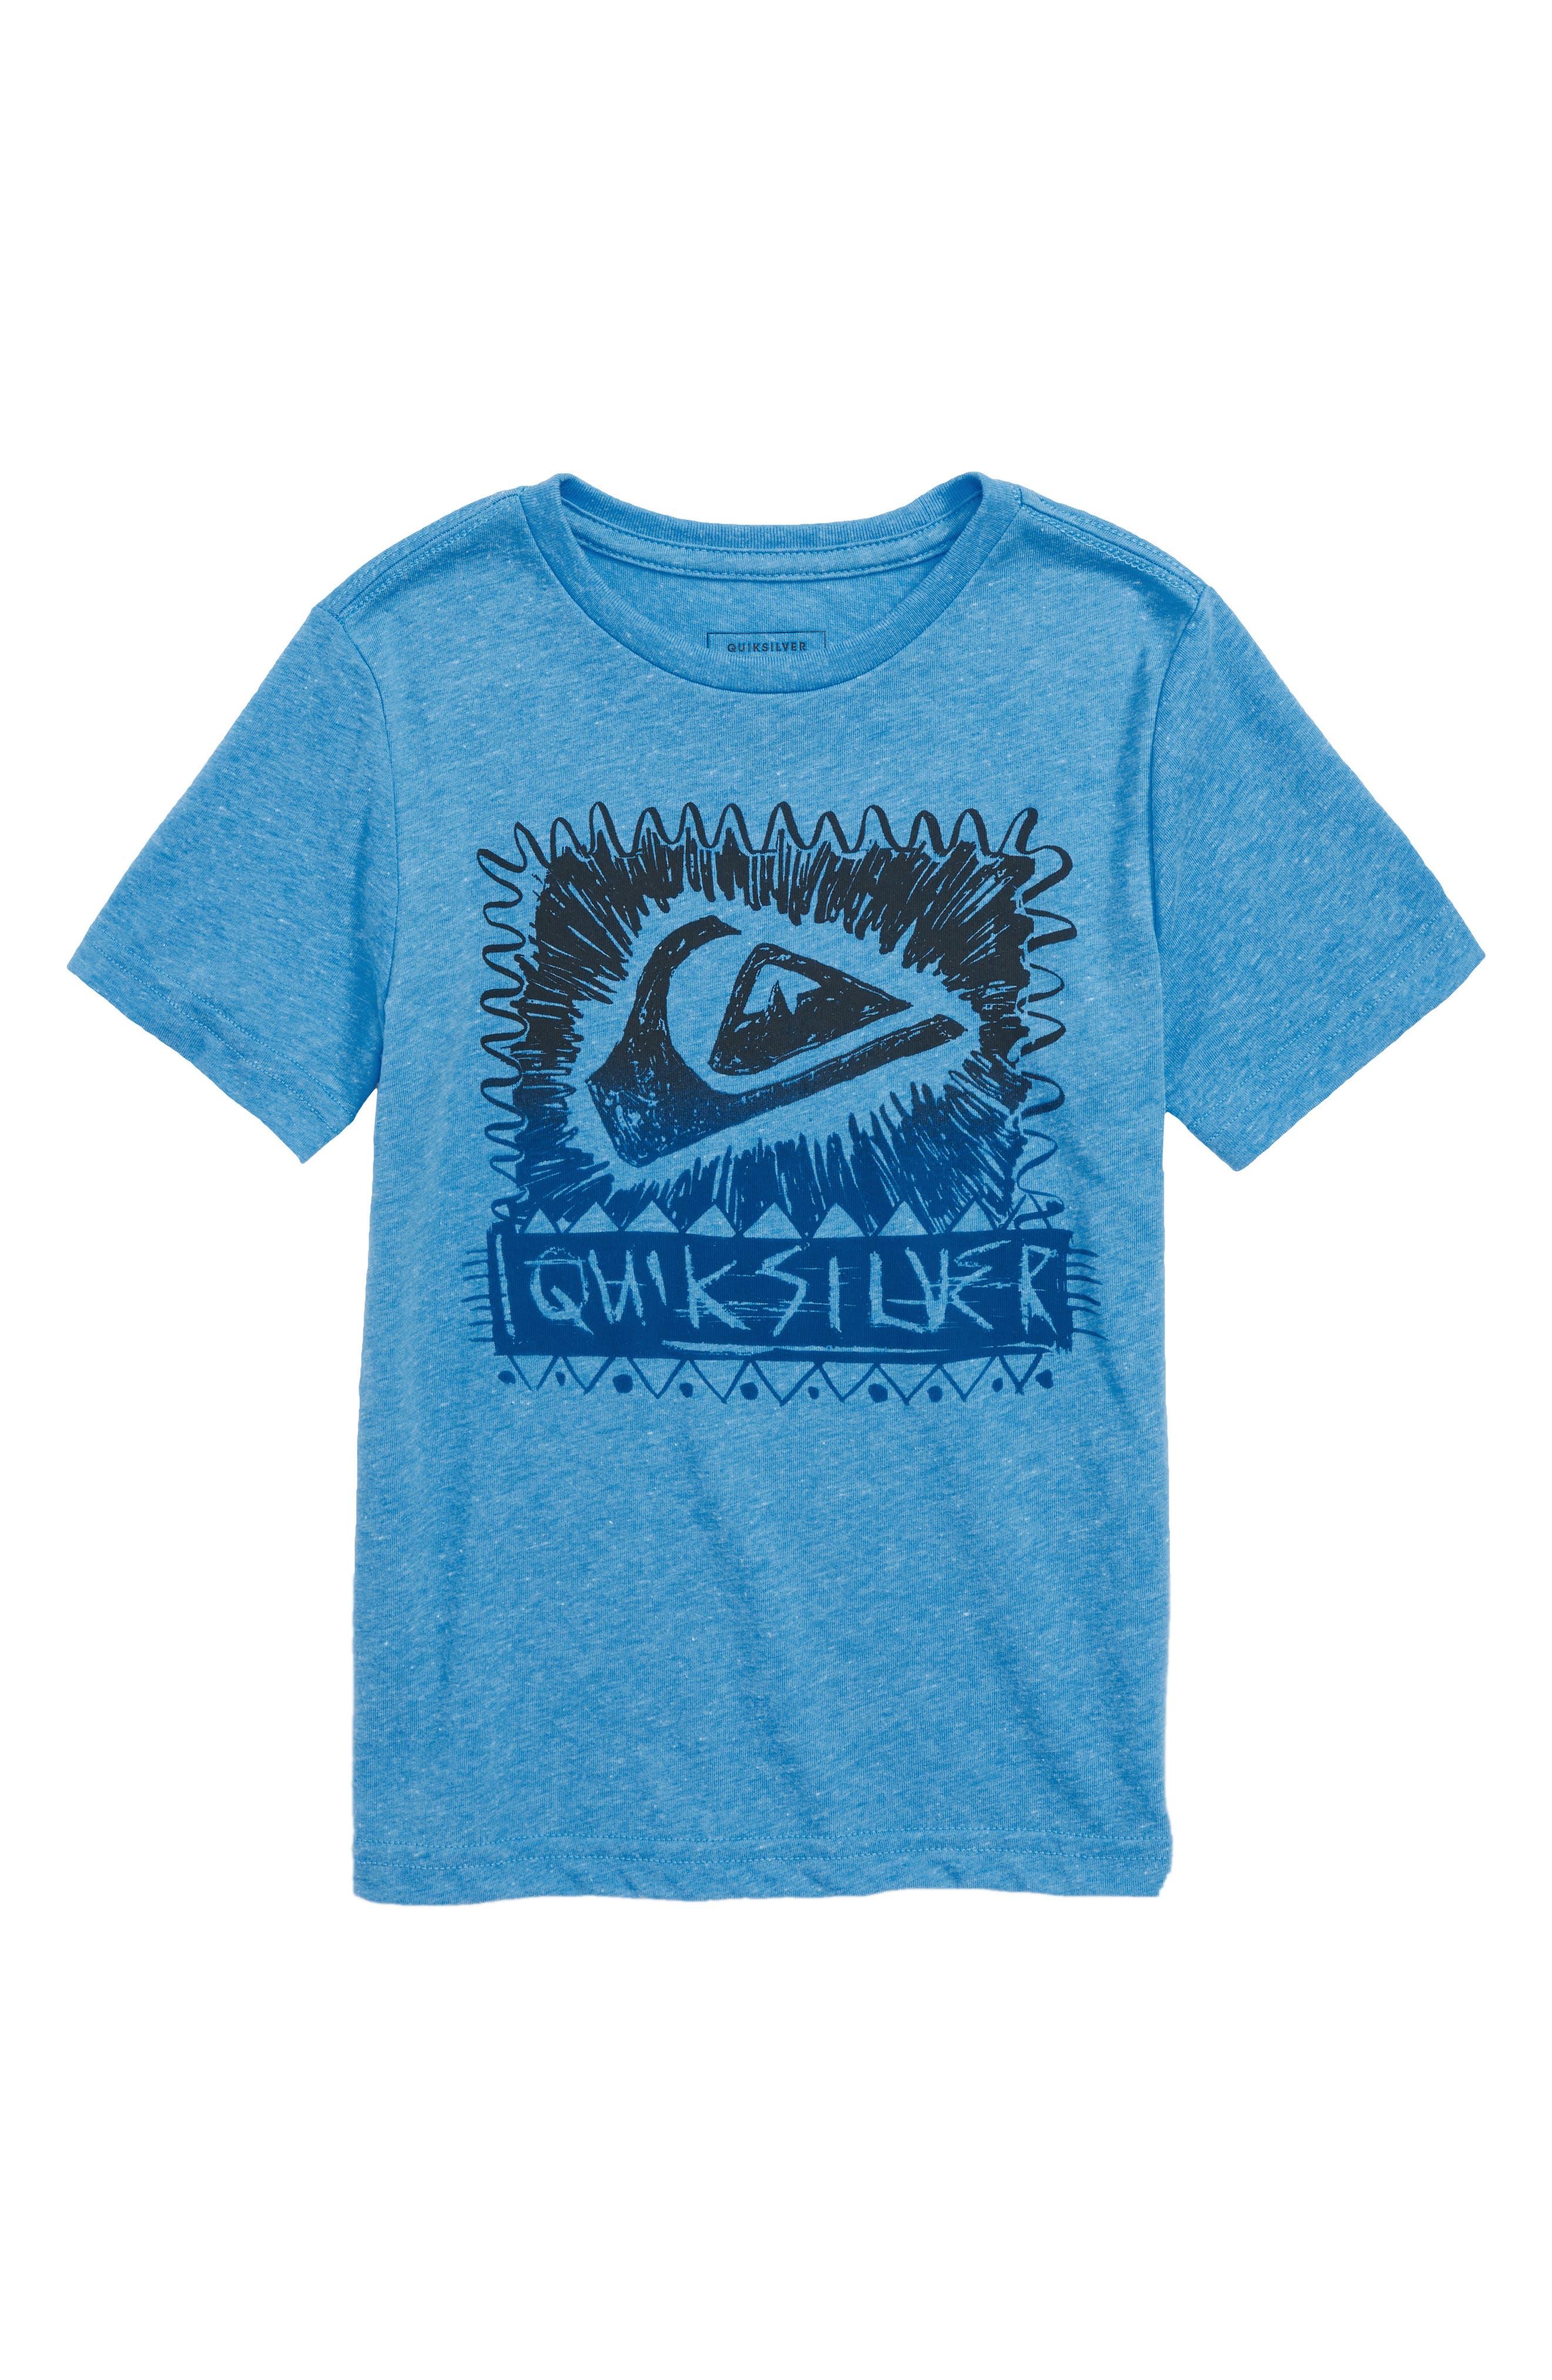 Quicksilver Laser Cut Graphic T-Shirt,                         Main,                         color, 422